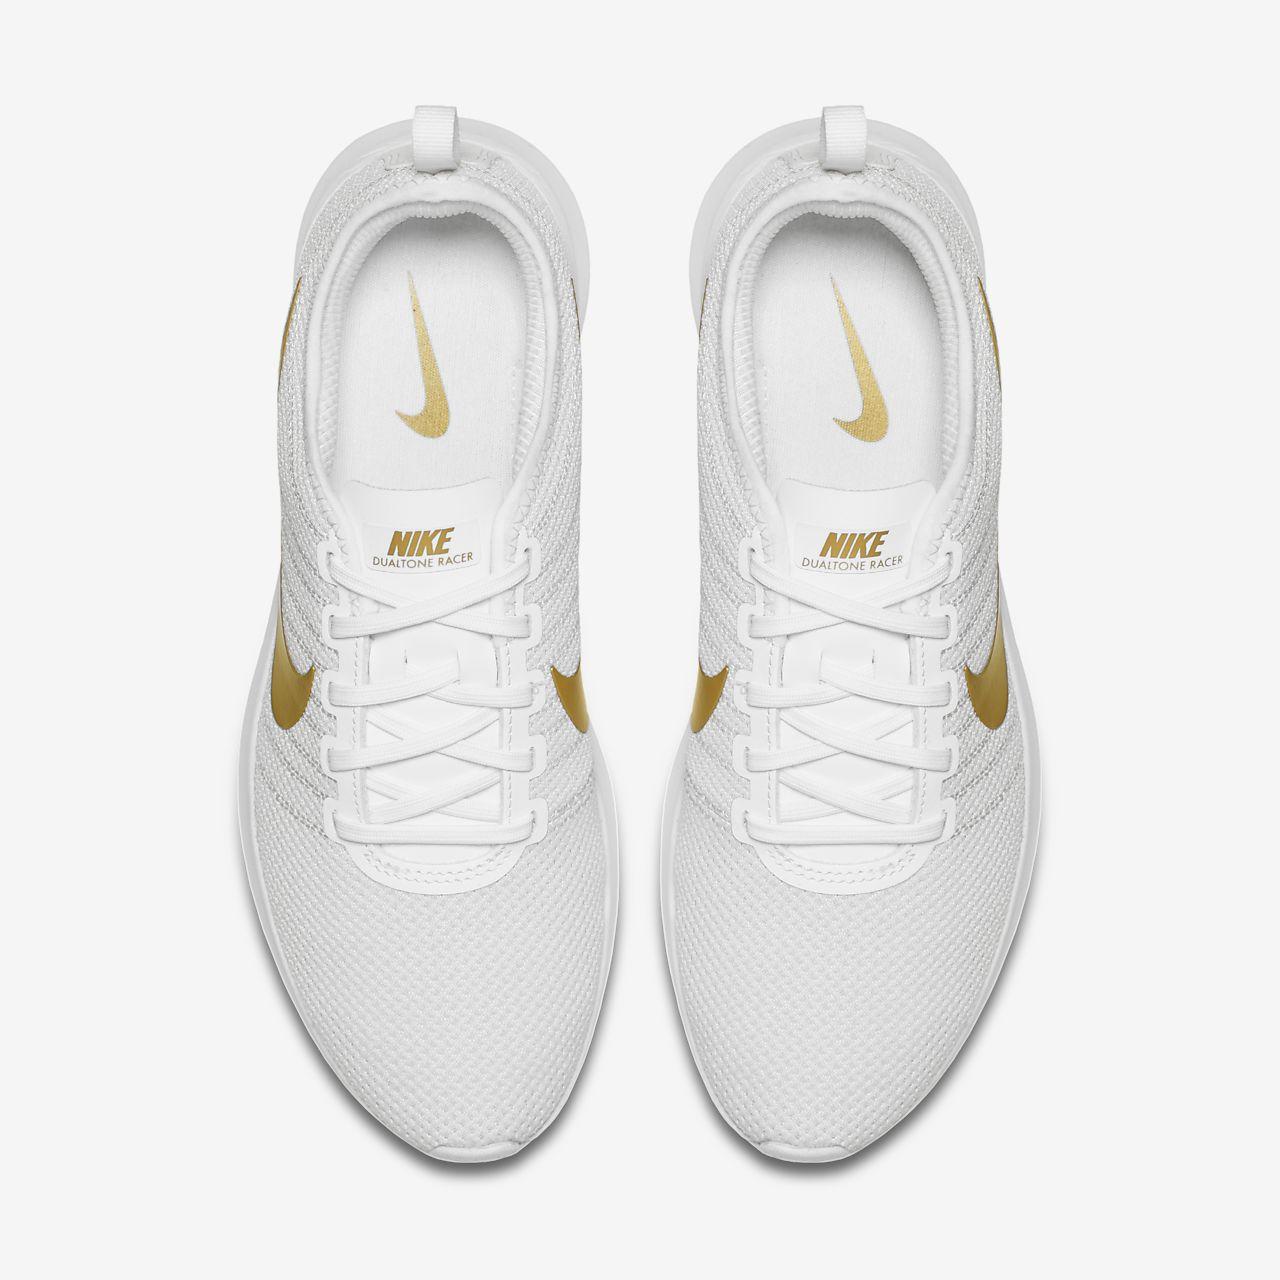 W Se Racer Femmes Dualtone Whitegold Nike Chaussures tqAn8vExf